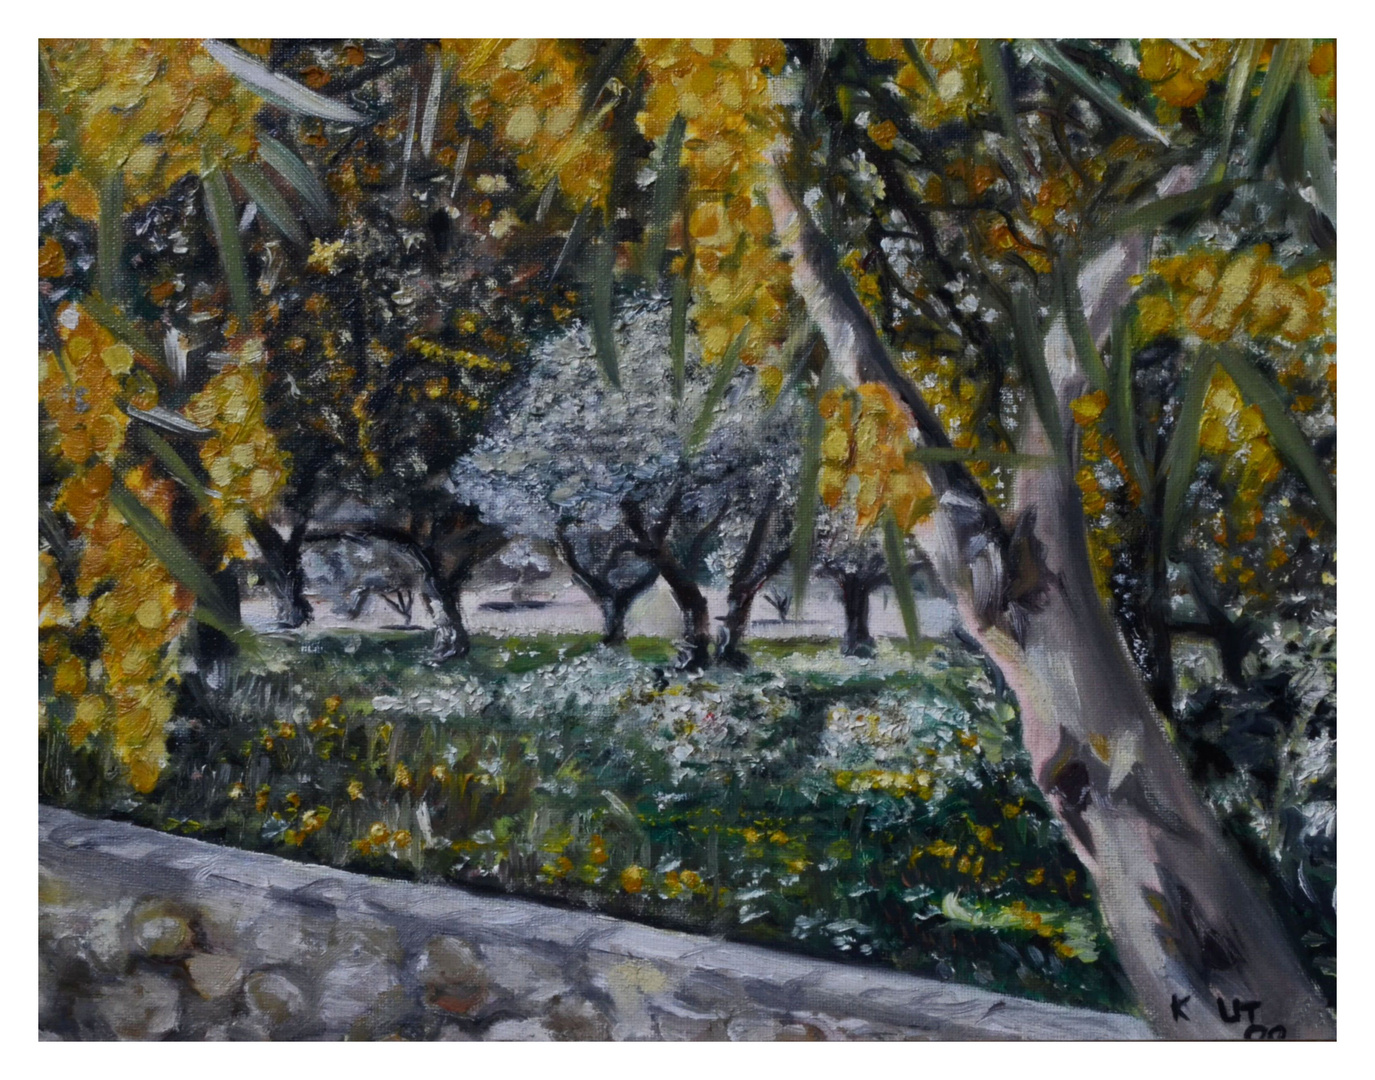 Spring on crete